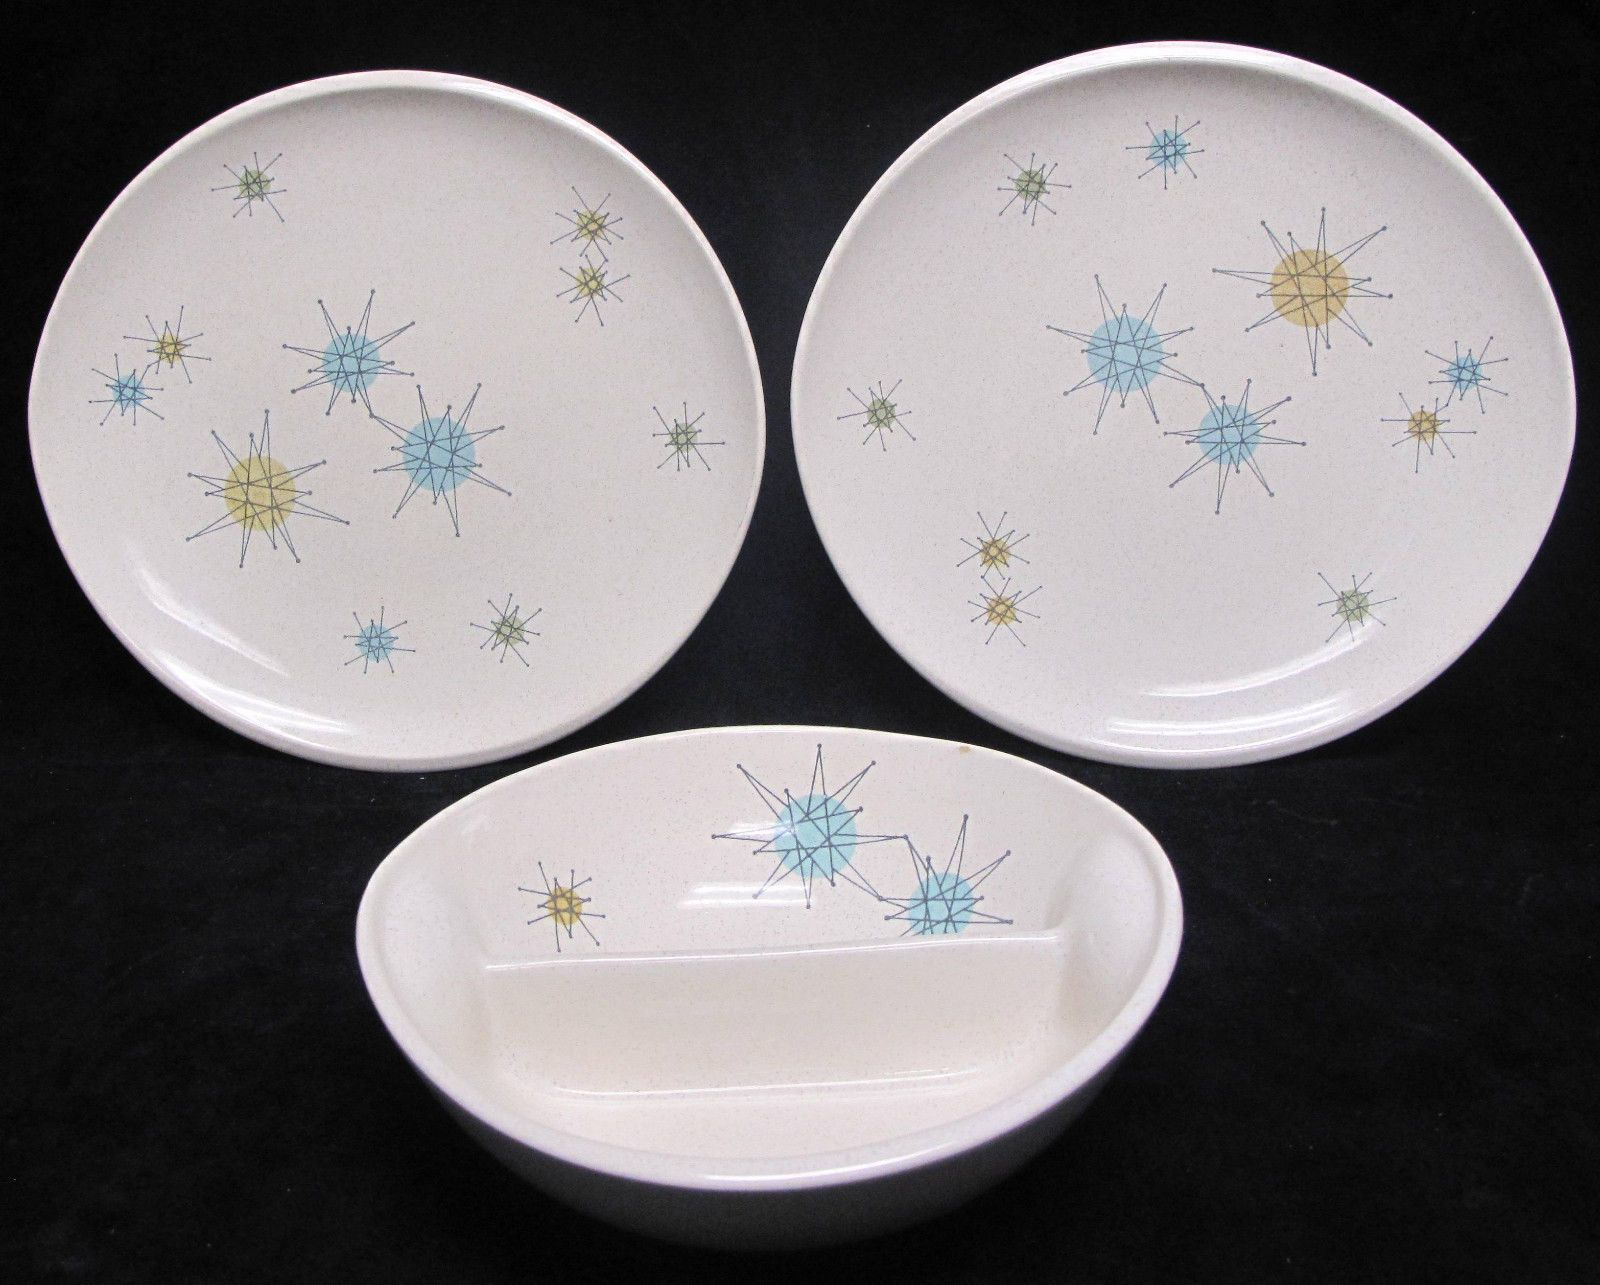 Franciscan China Starburst Set of 2 Oval Dinner Plates and Divided Serving Bowl | eBay & Franciscan China Starburst Set of 2 Oval Dinner Plates and Divided ...